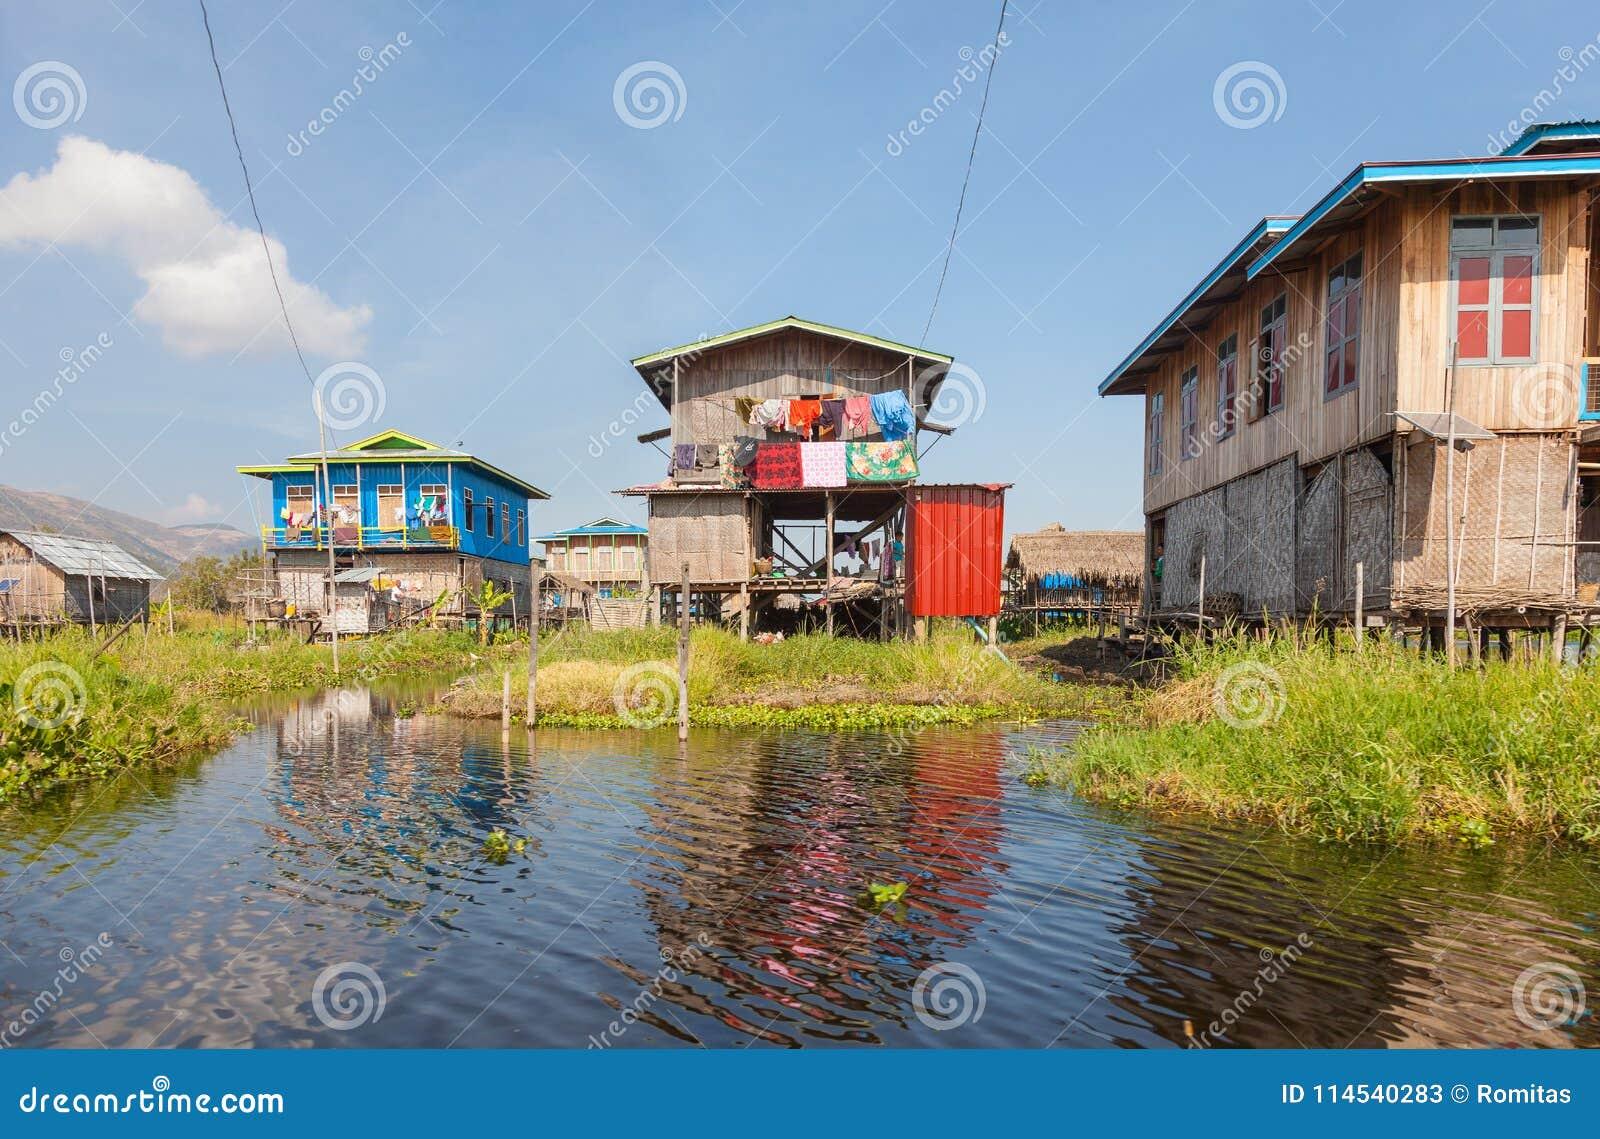 Hupin Nyaung Shwe Village At Inle Lake Editorial Stock Photo